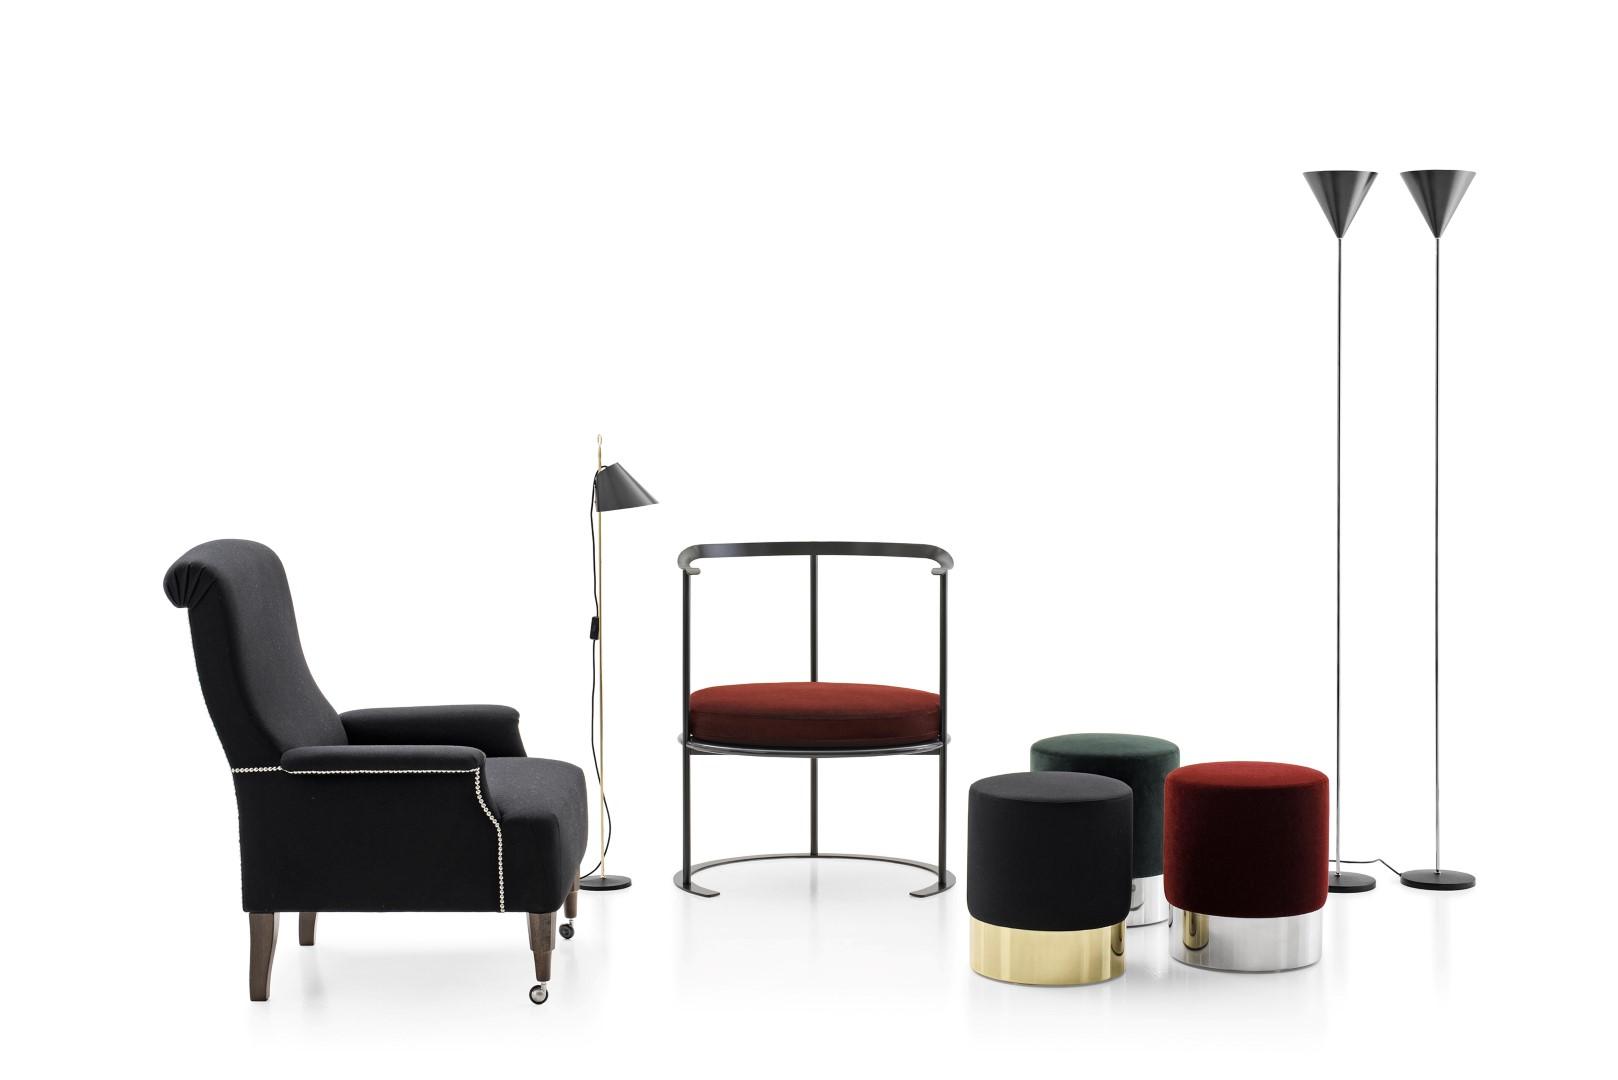 maison et objet settembre 2018 b b italia luigi caccia. Black Bedroom Furniture Sets. Home Design Ideas